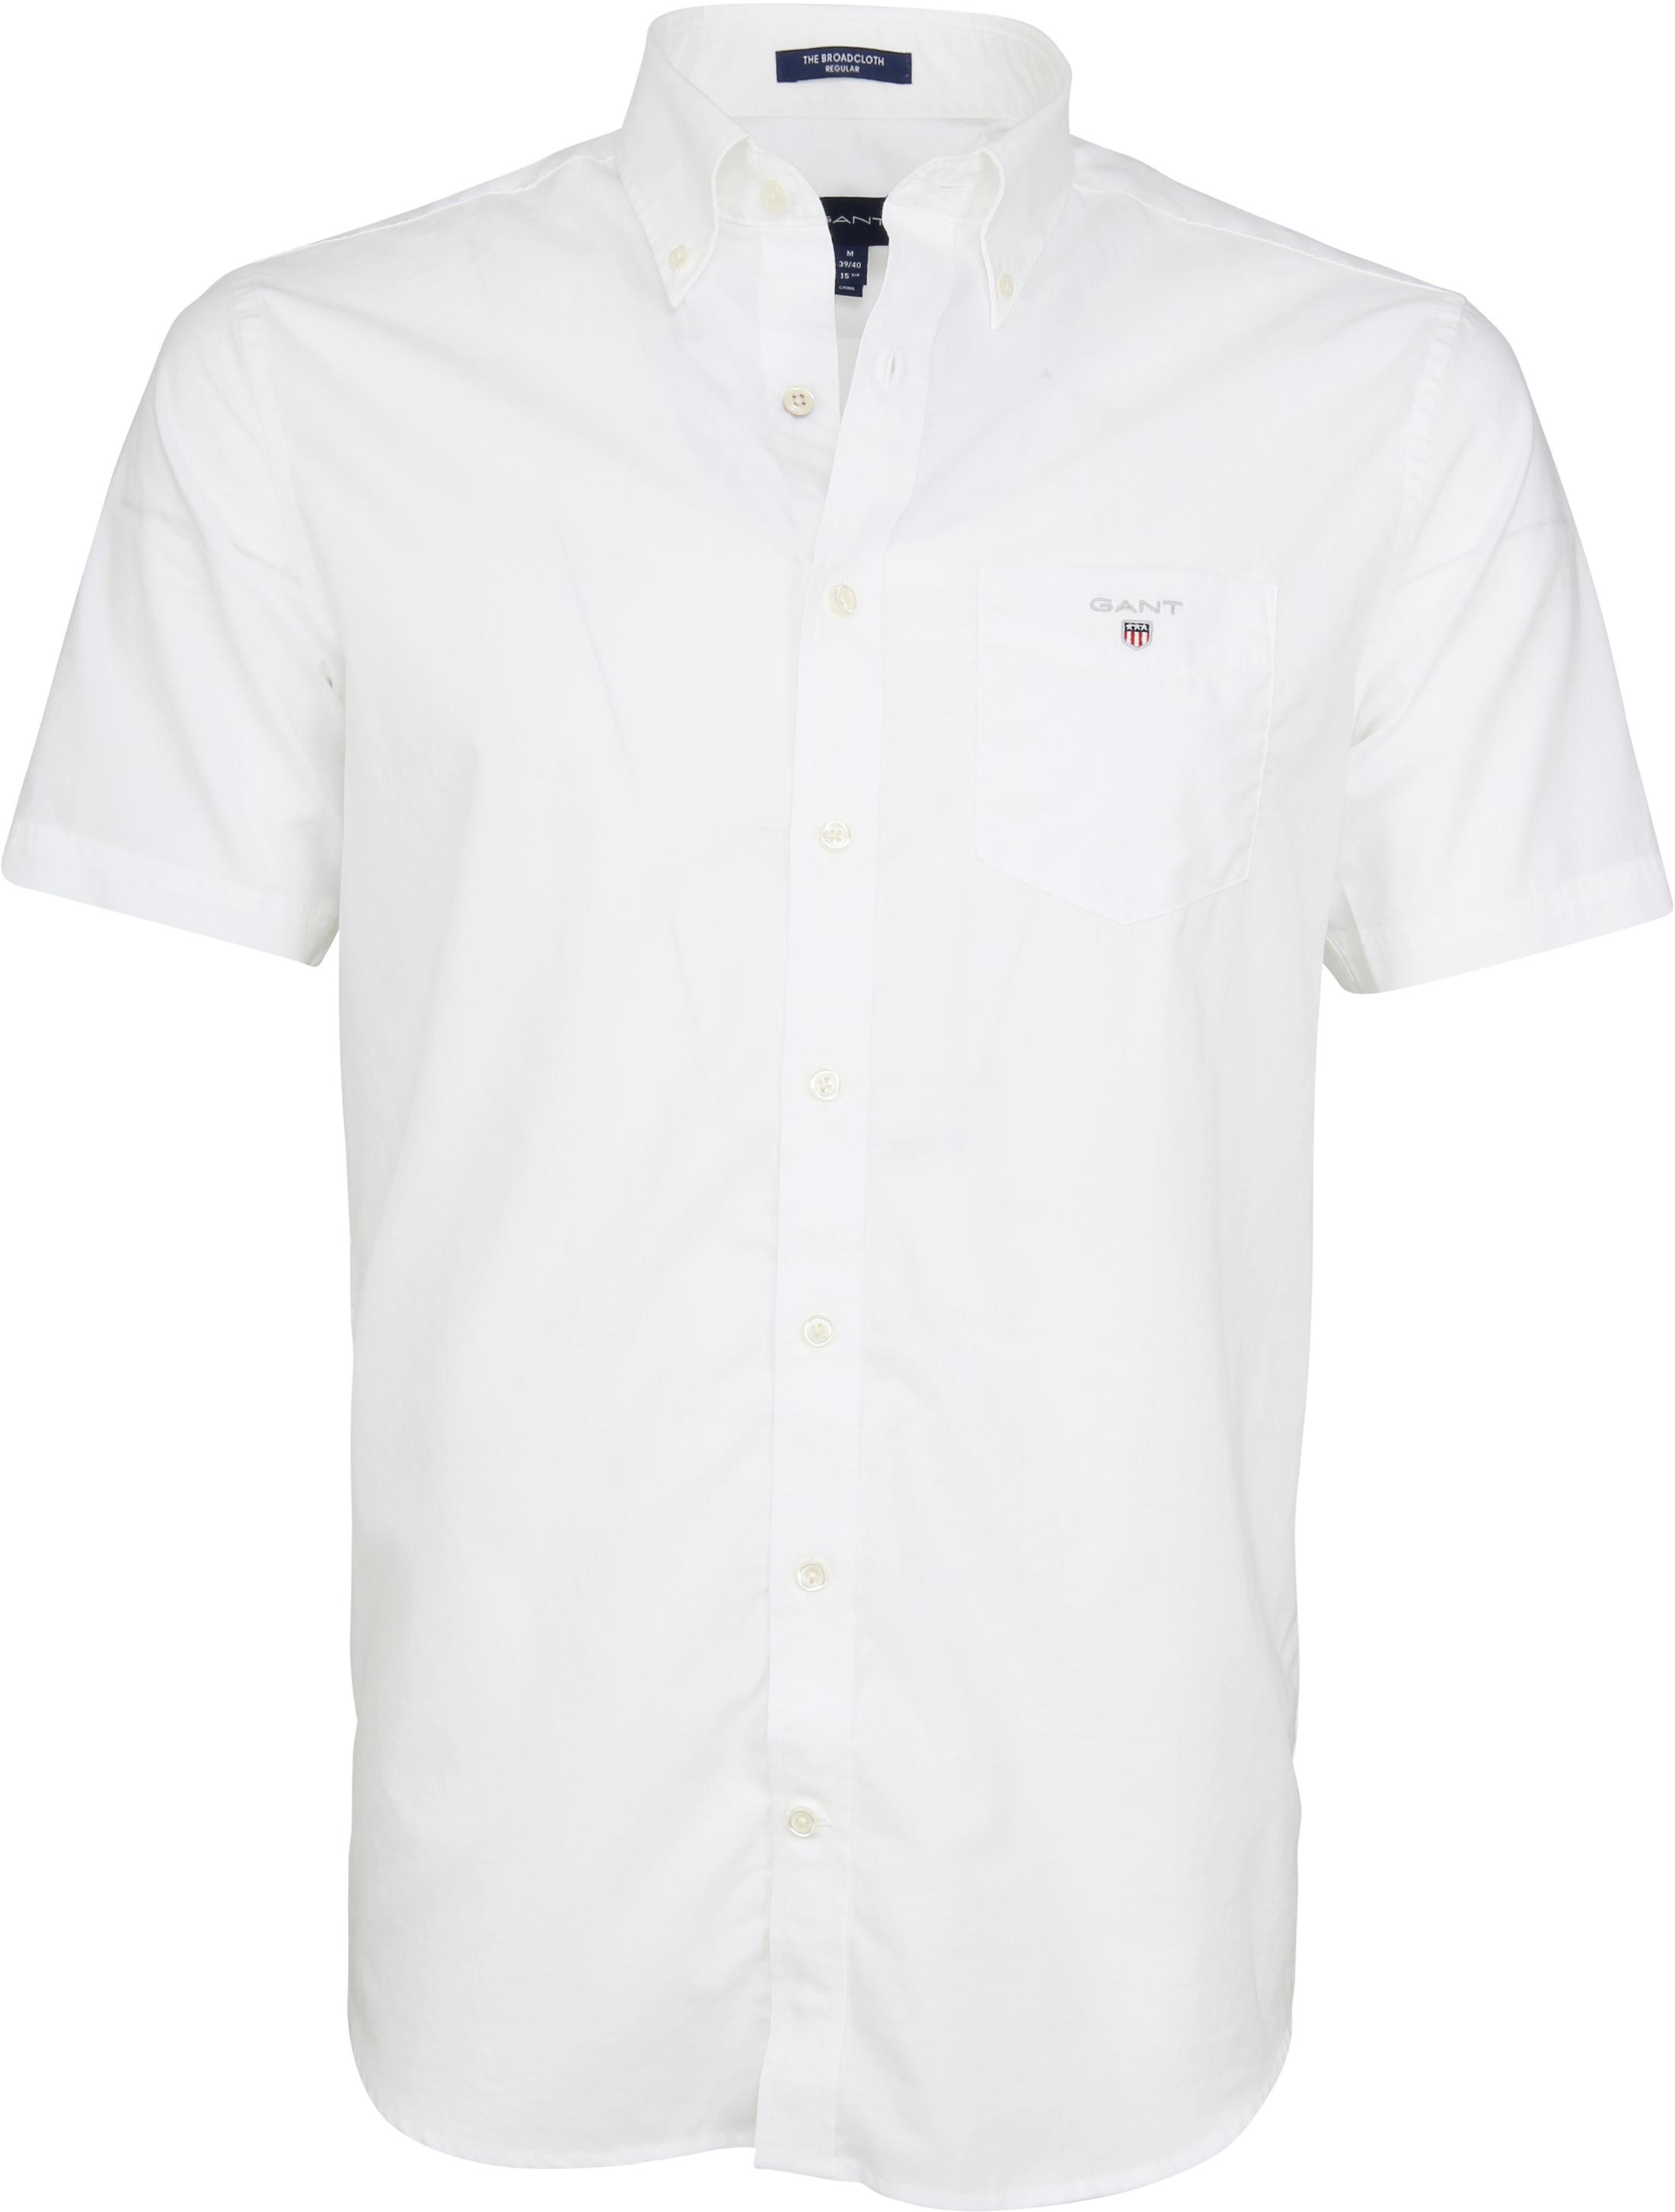 Gant Overhemd SS Broadcloth Wit foto 0